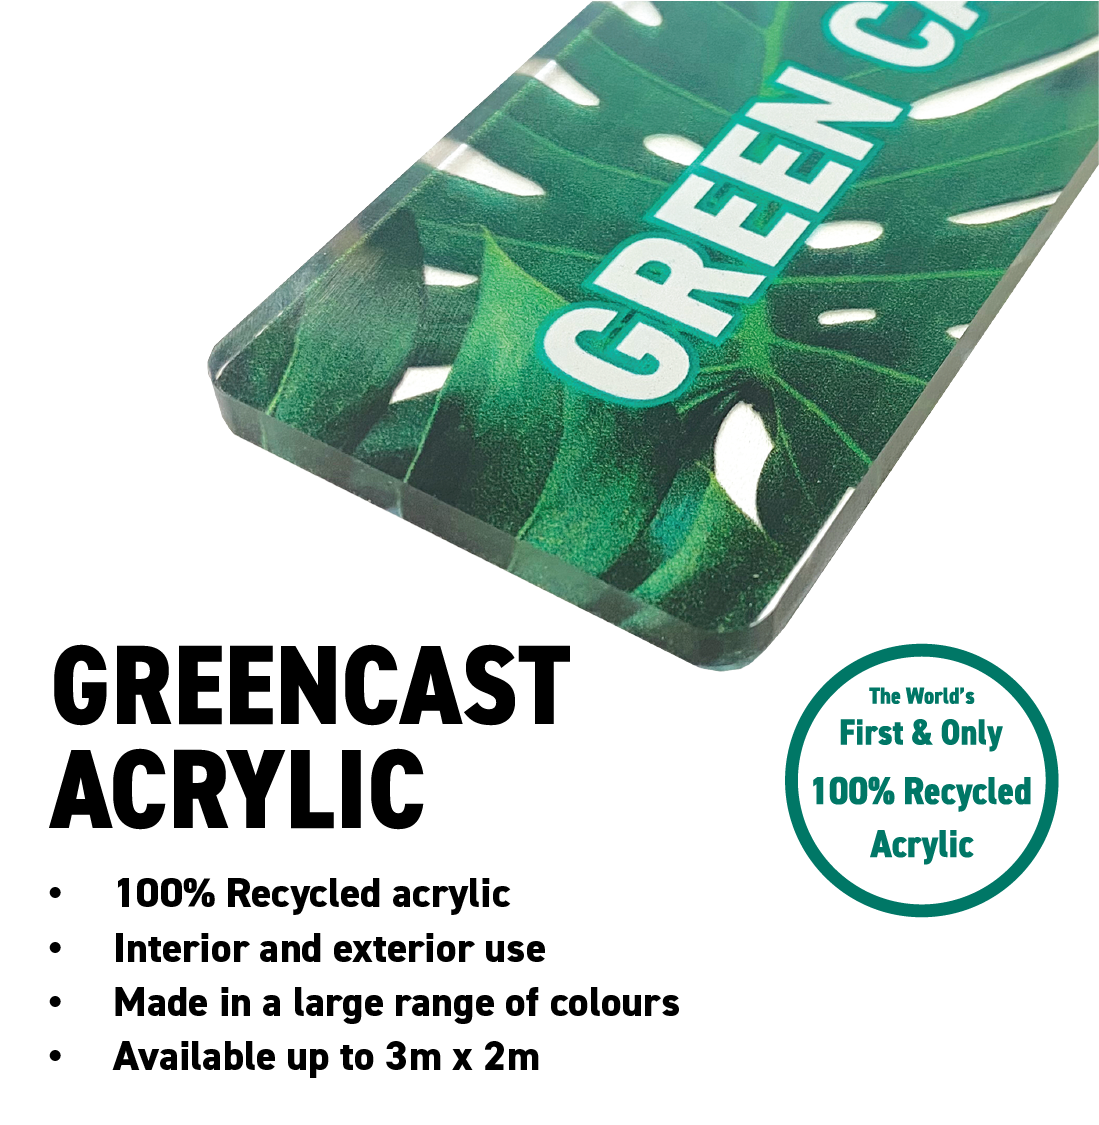 Greencast Acrylic Amari 100% recycled